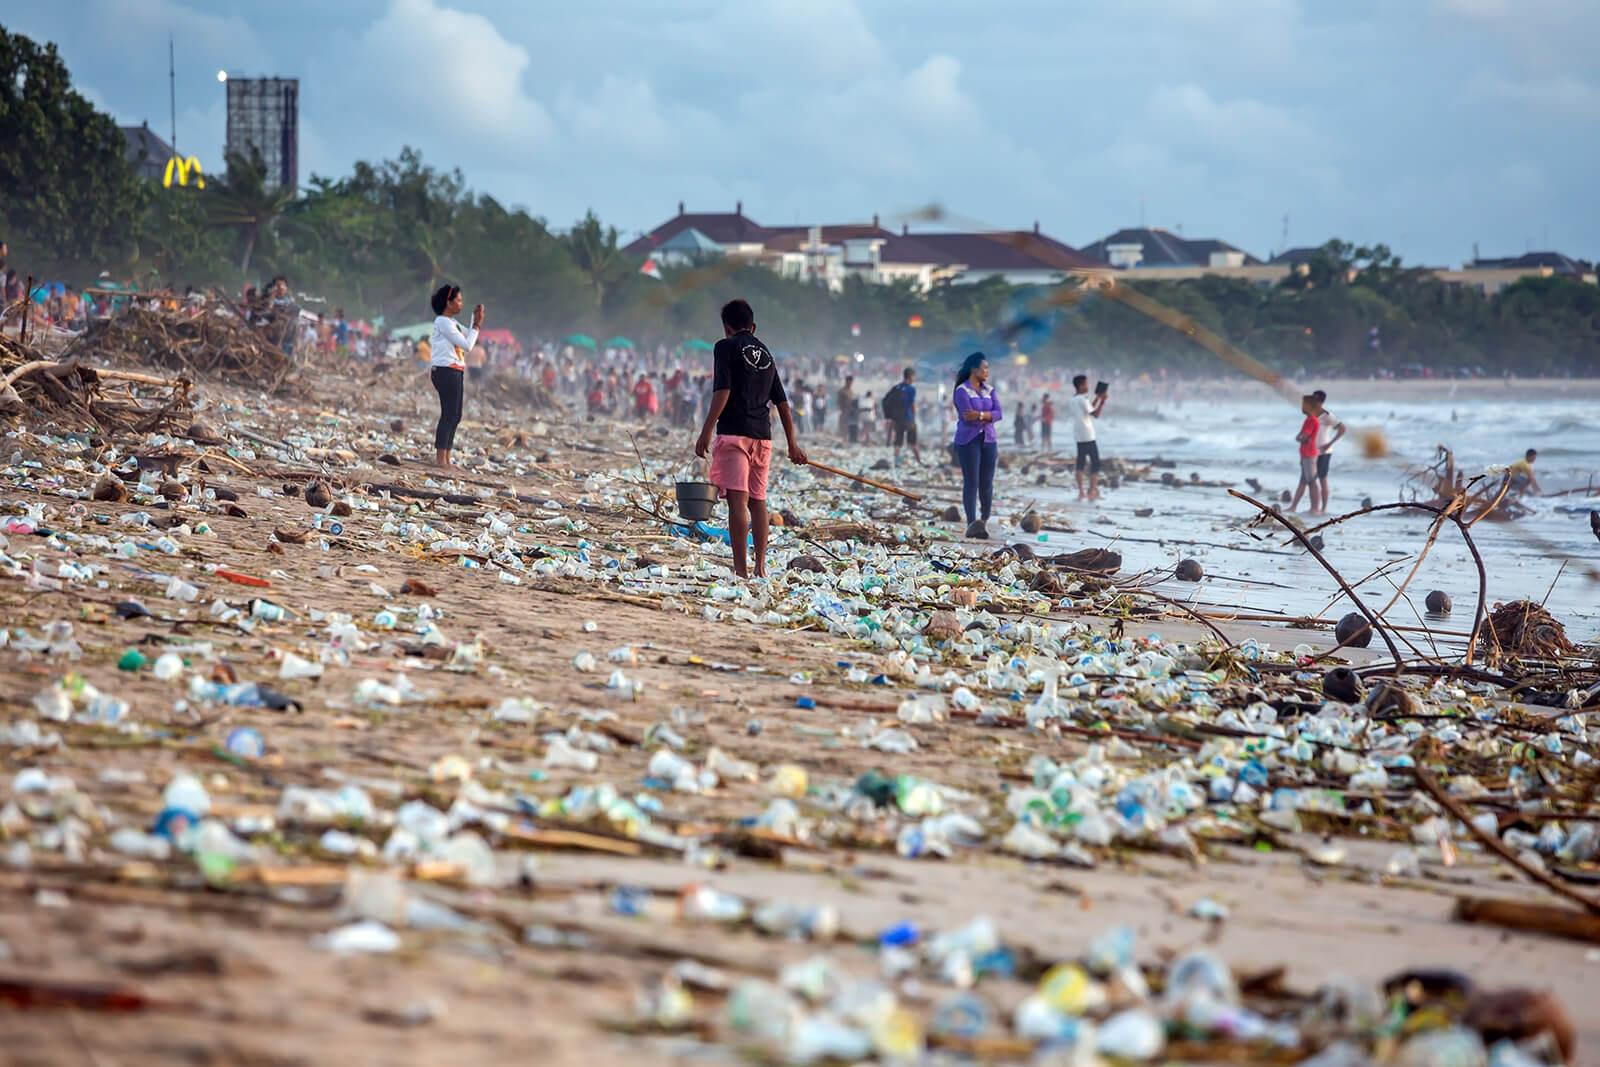 Our Blue Habits program targets everyday behaviors that impact ocean health, like plastic use.